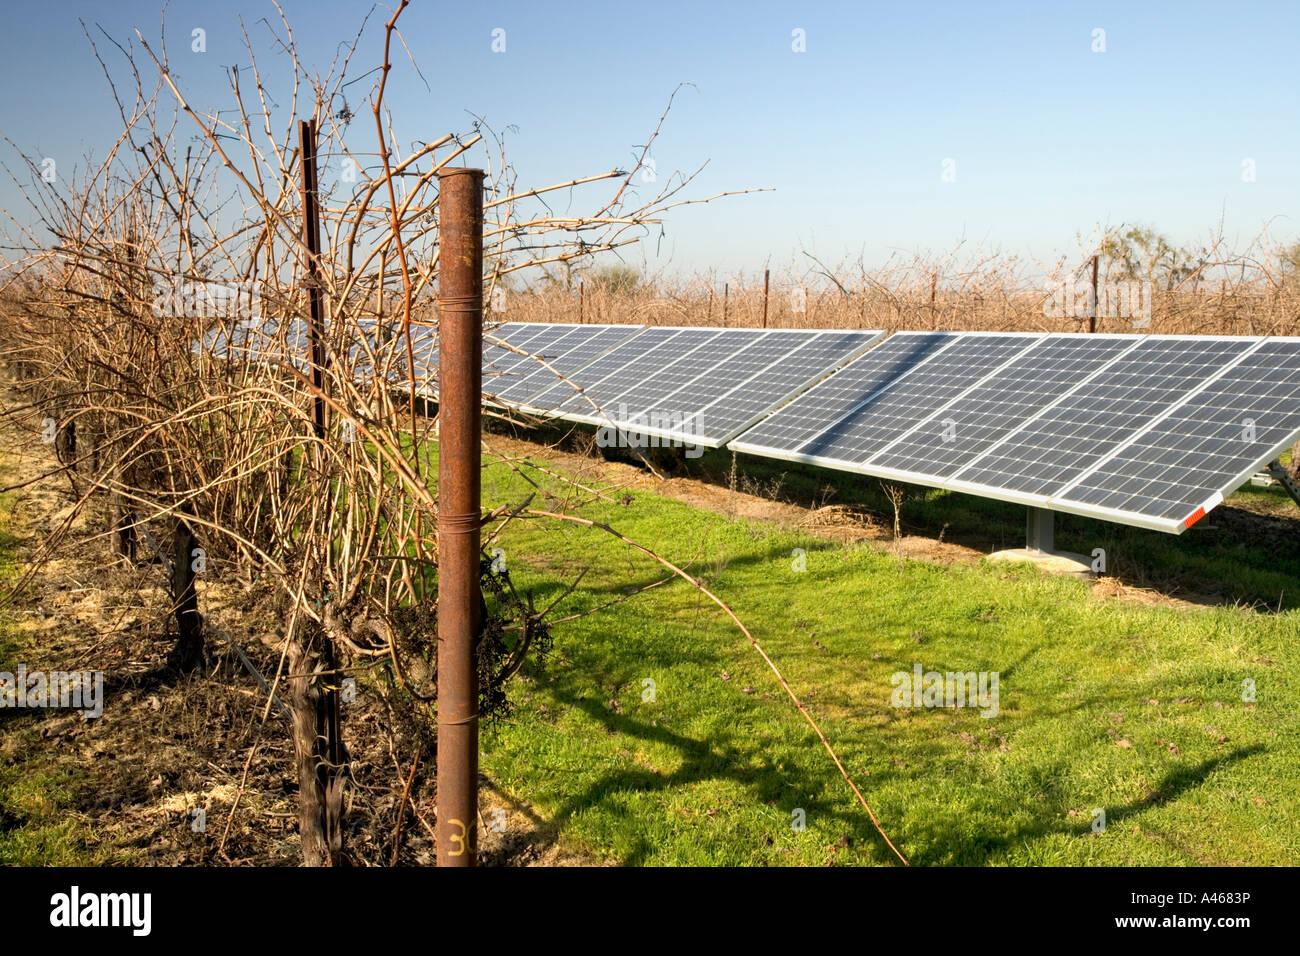 Solar panels operating in dormant vineyard. - Stock Image